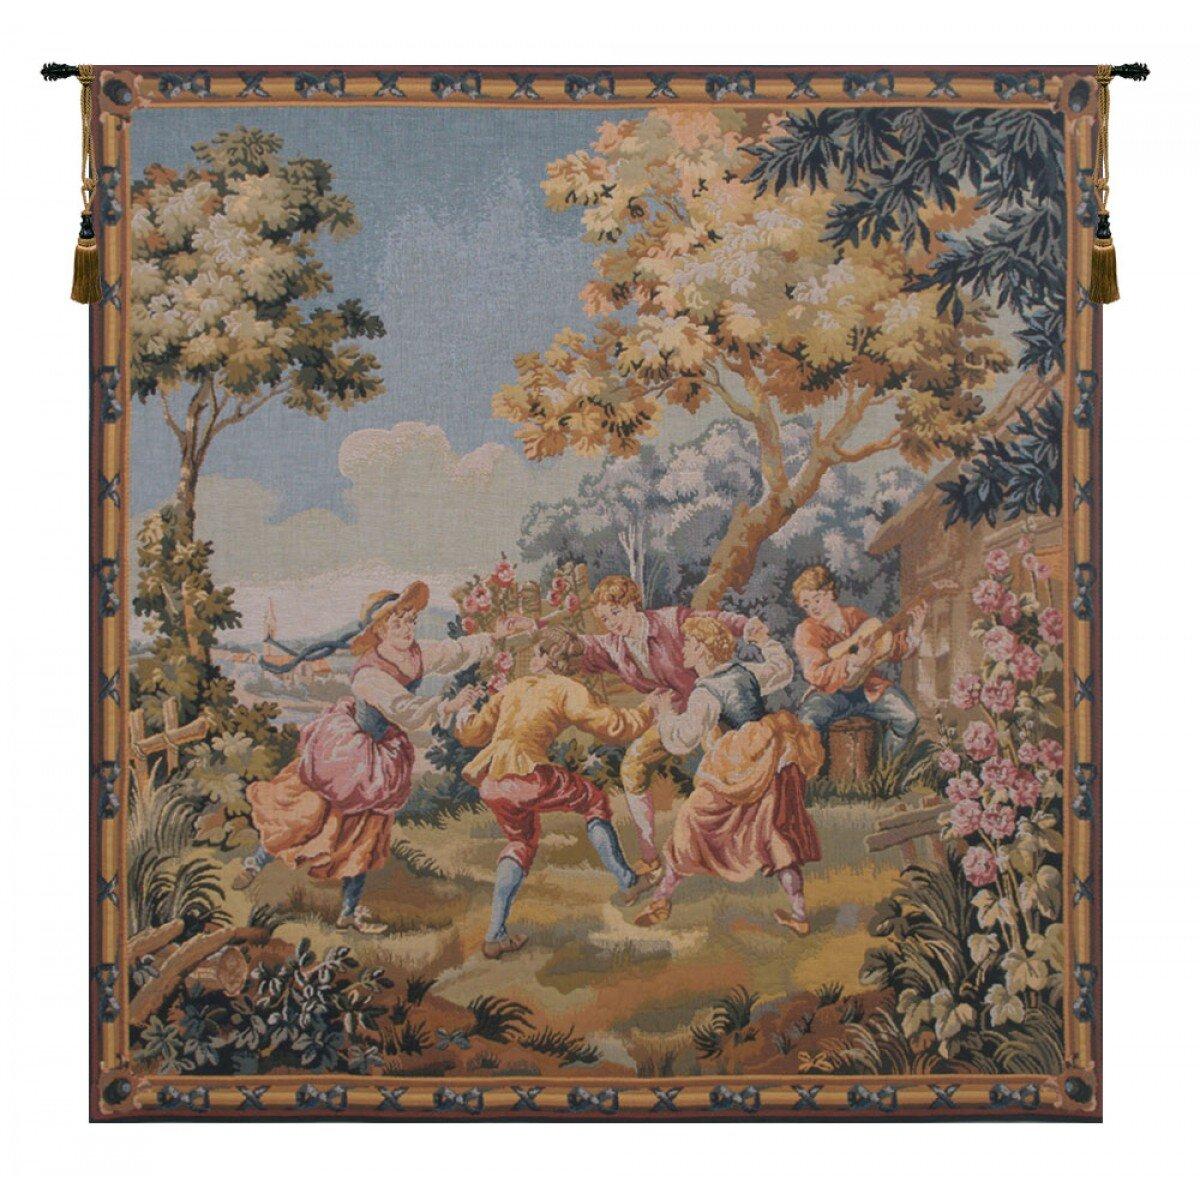 40 X 60 Art Tapestries You'll Love In 2021 | Wayfair Regarding 2018 Blended Fabric Woodpecker European Tapestries (View 6 of 20)